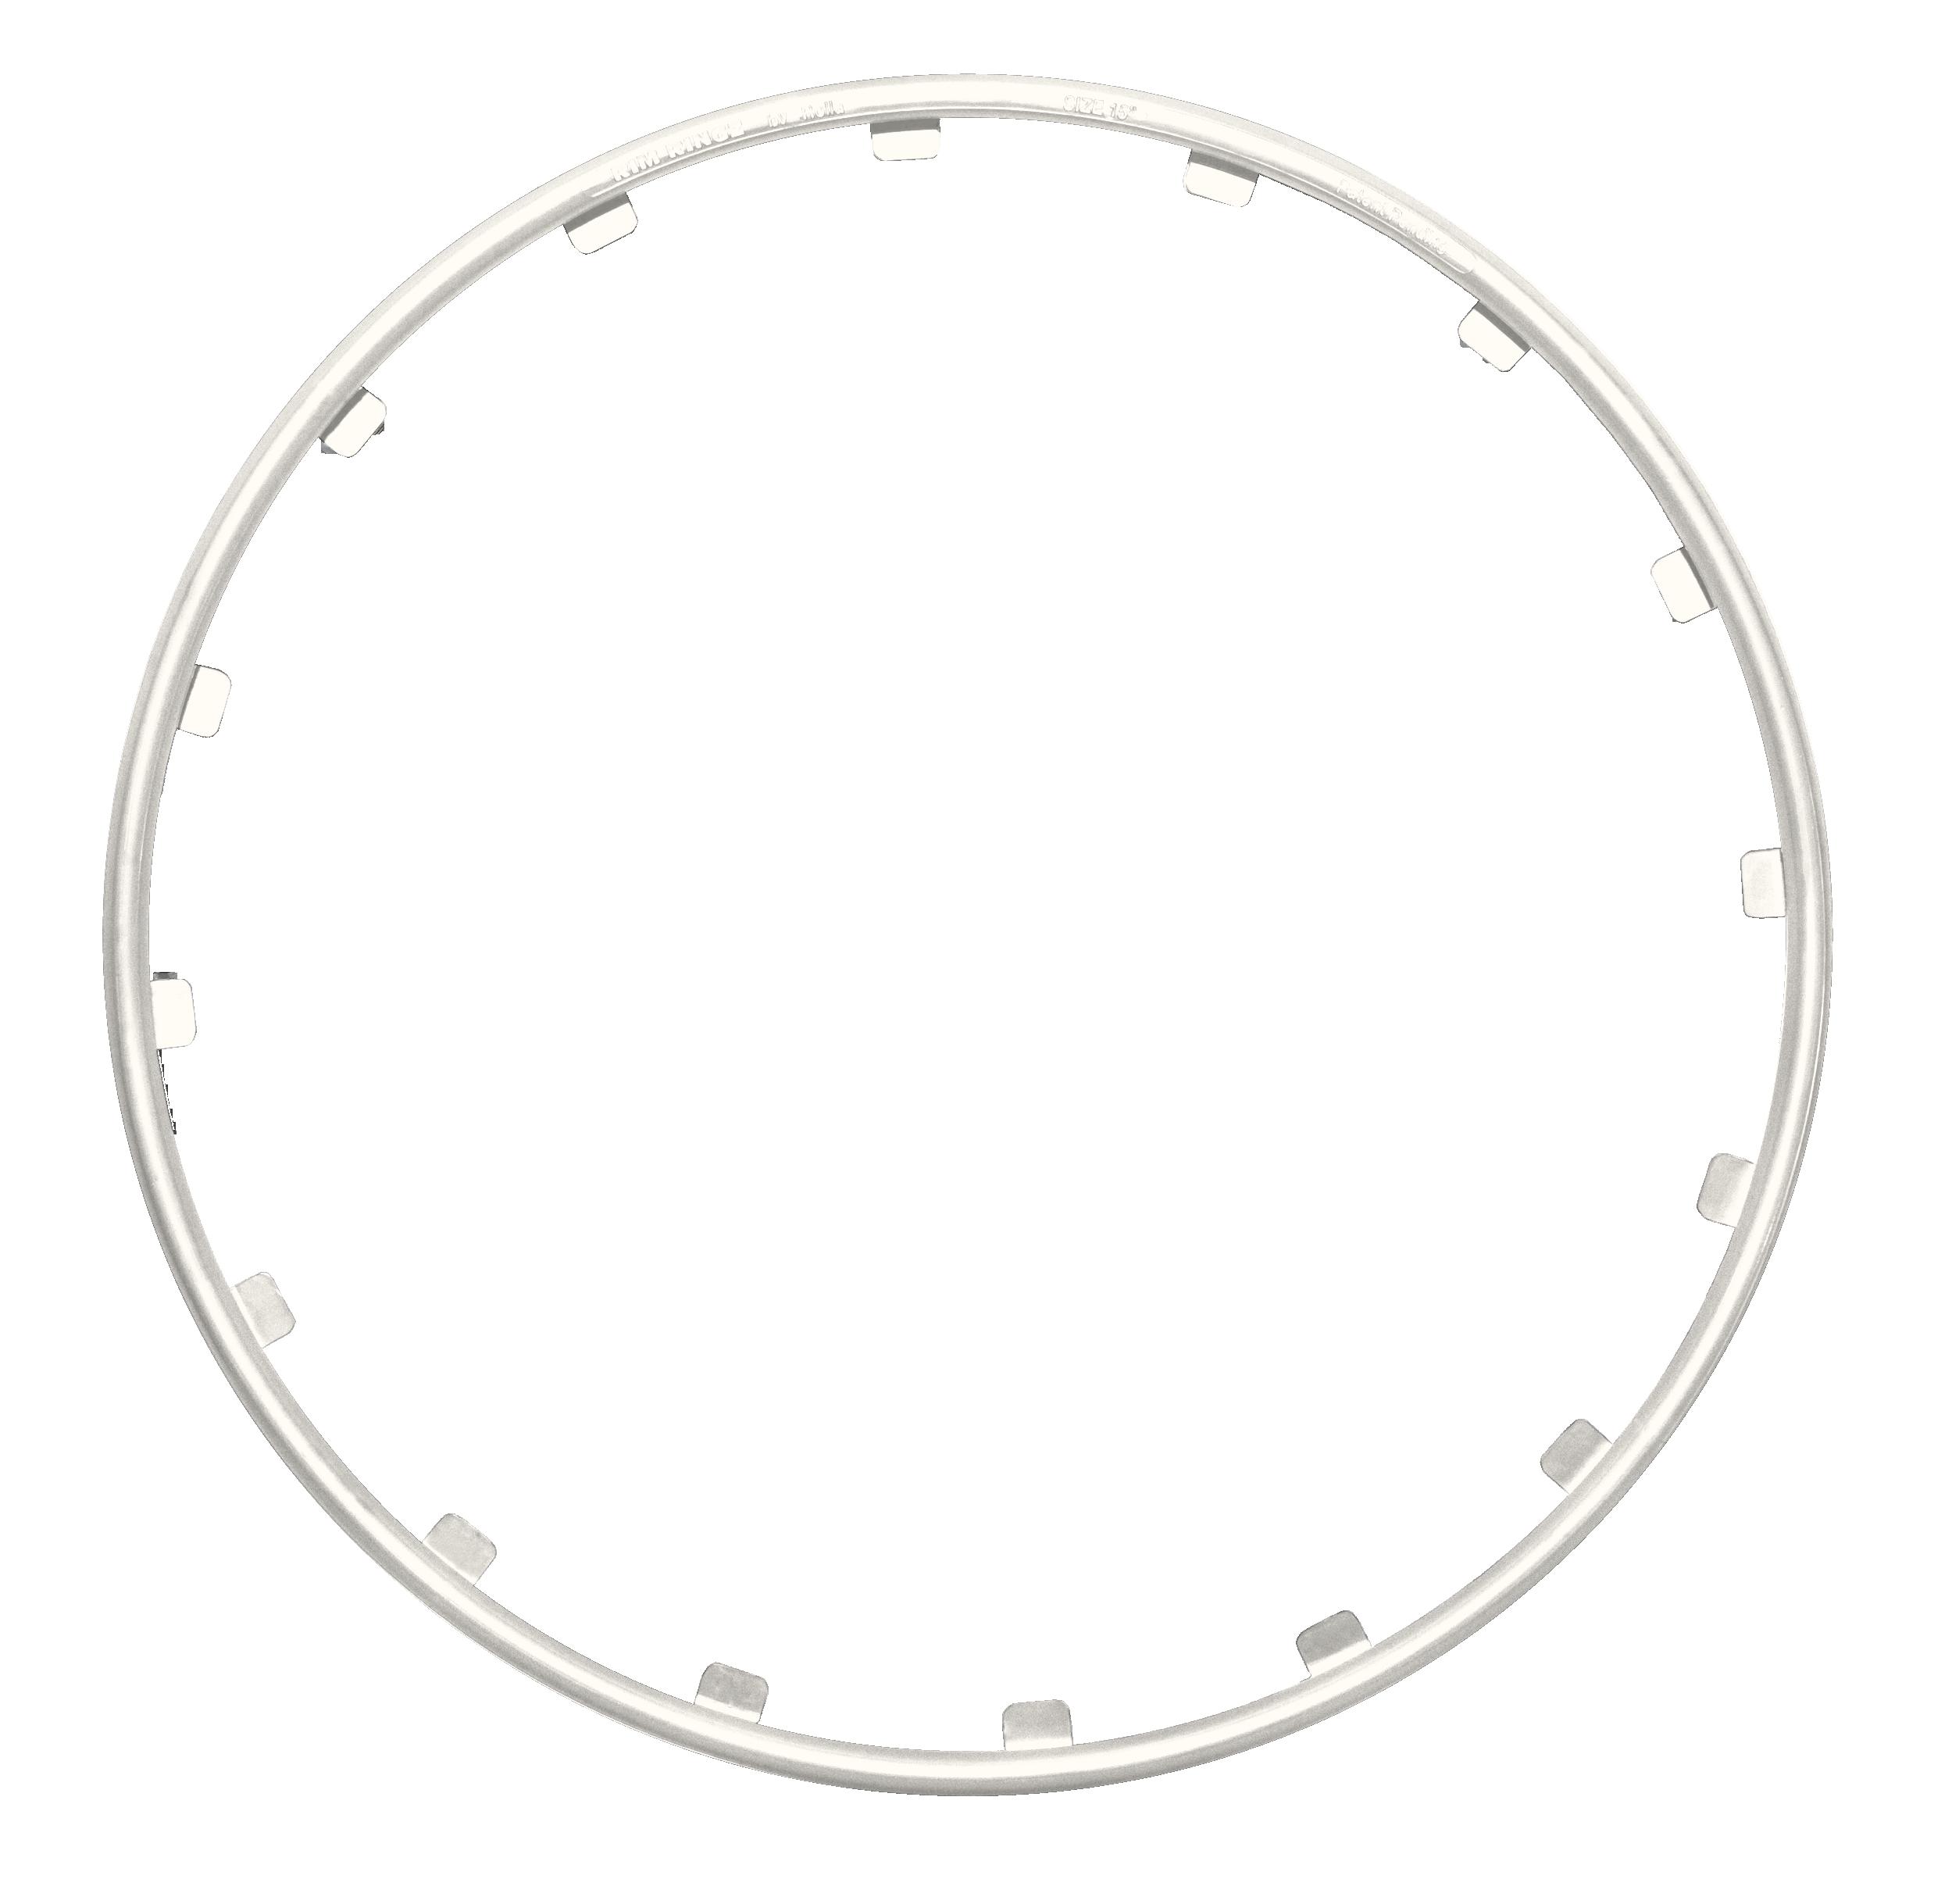 rim-ringz-white-2.png